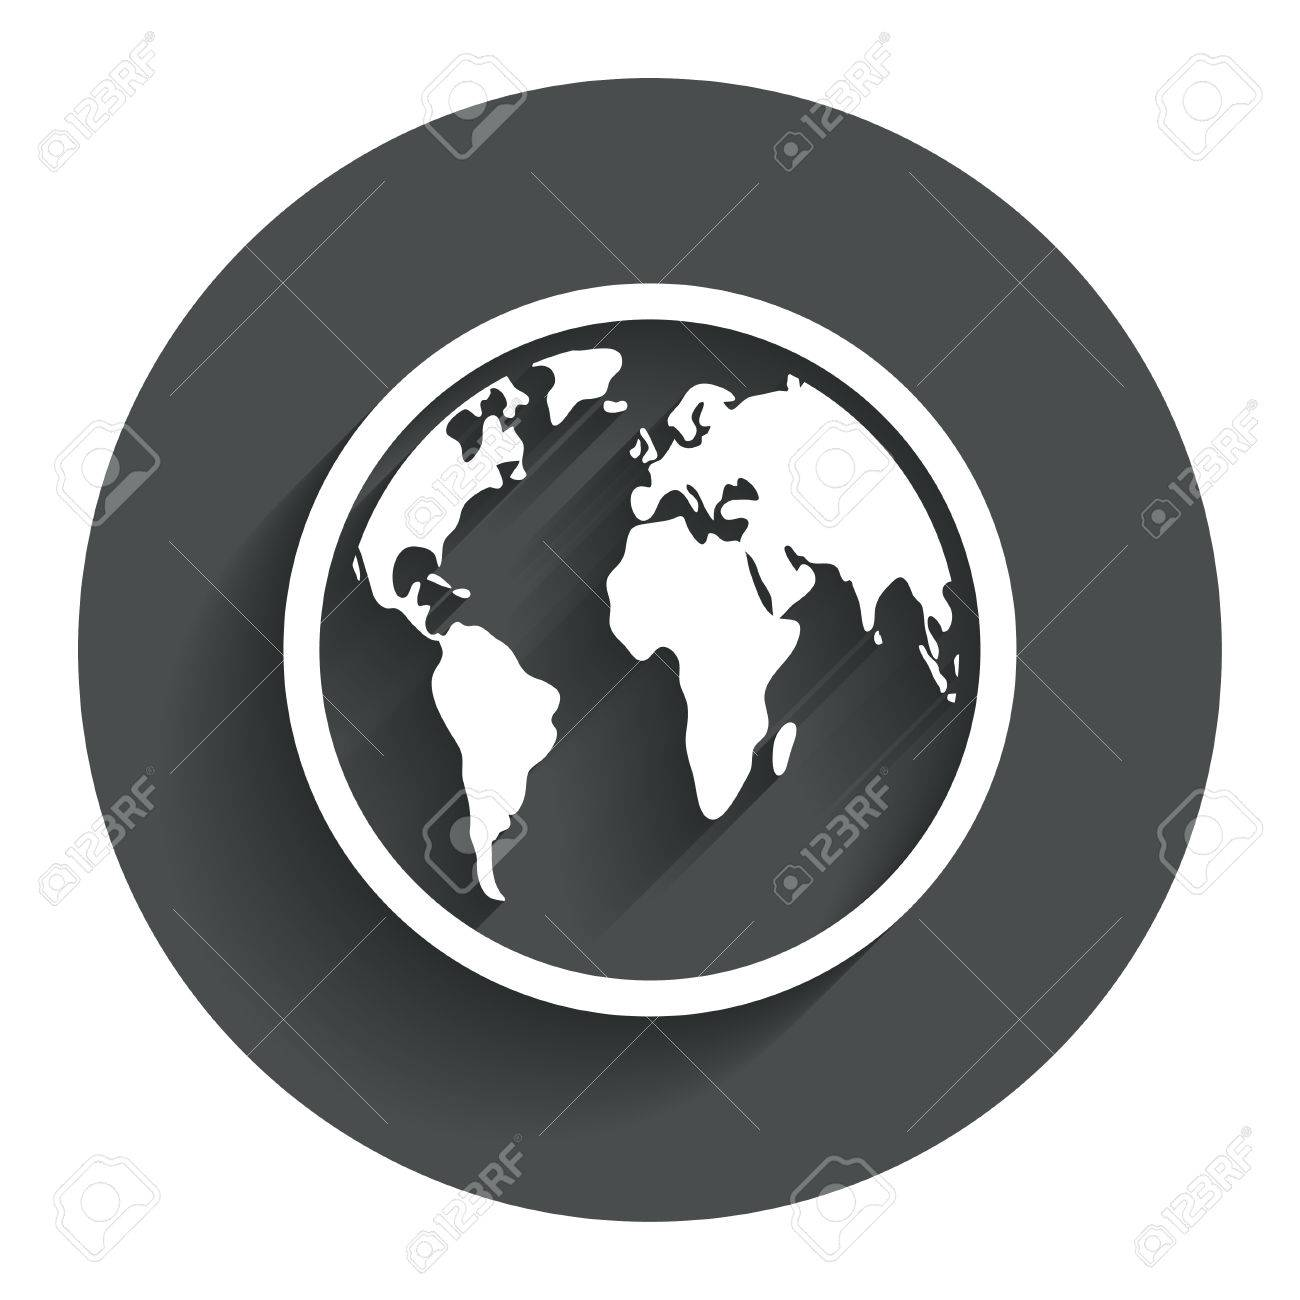 Globe sign icon world map geography symbol circle flat button with world map geography symbol circle flat button with shadow modern gumiabroncs Choice Image